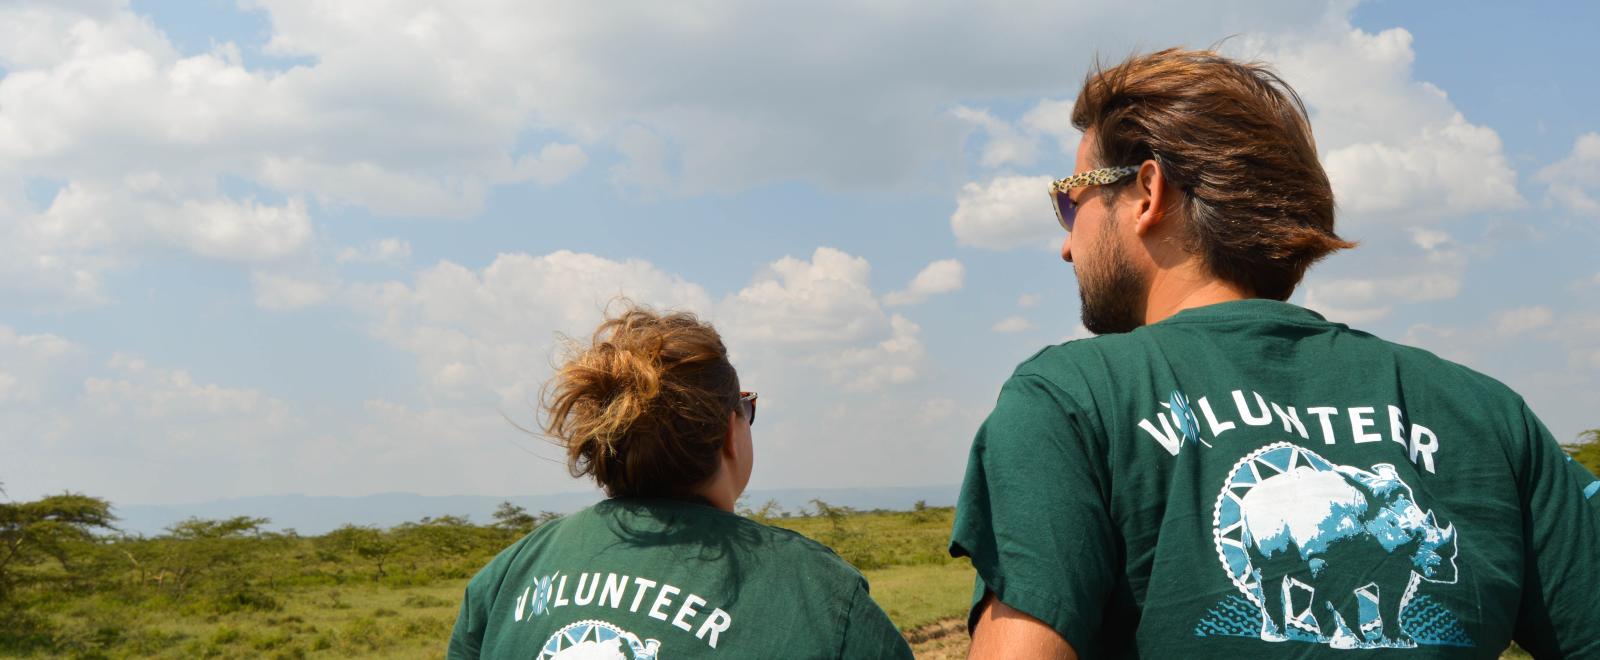 Conservation Volunteers in Kenya